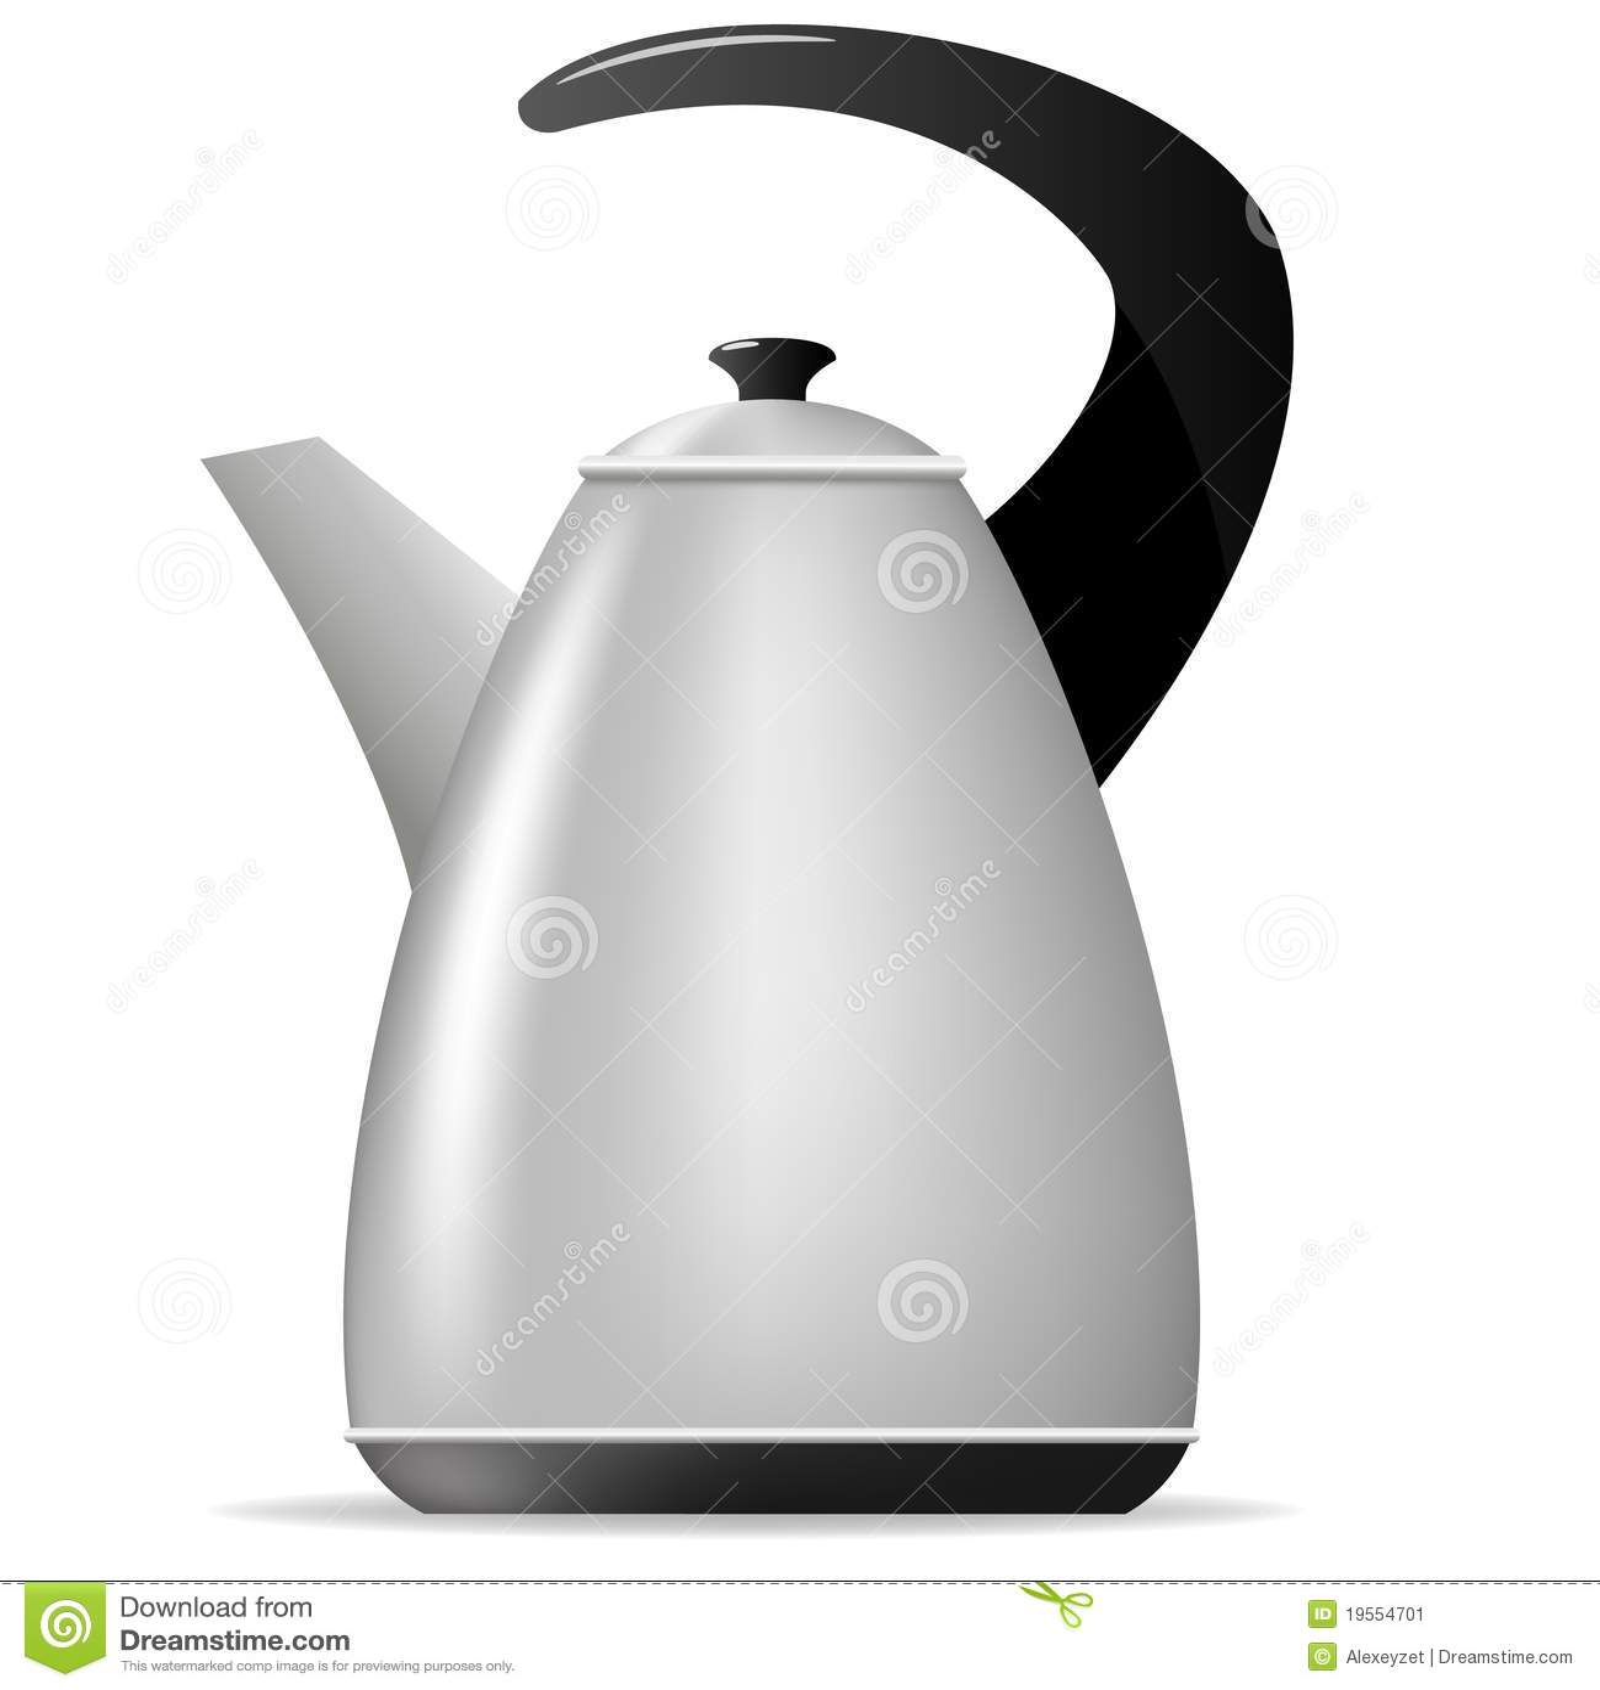 Vector Tea Kettle Stock Image - Image: 19554701